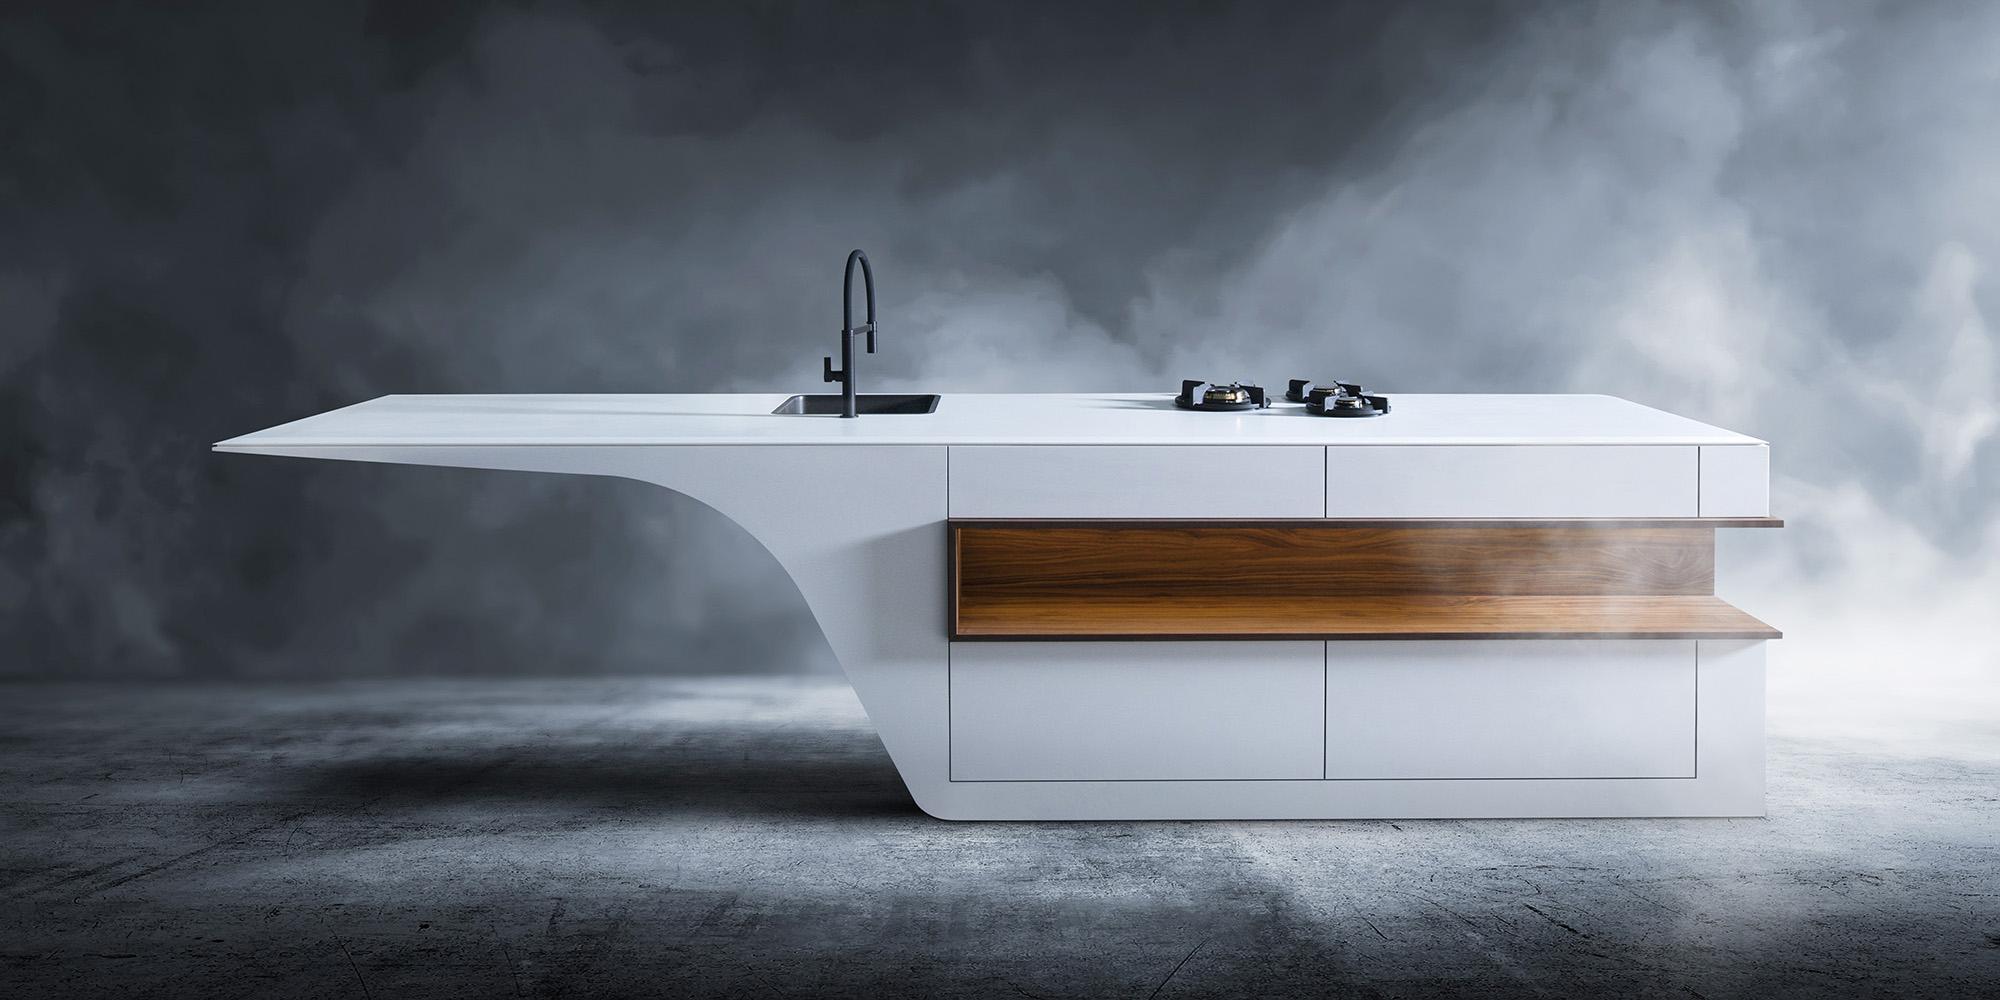 b dutch badkamers rvs kranen keukens en leefruimtes